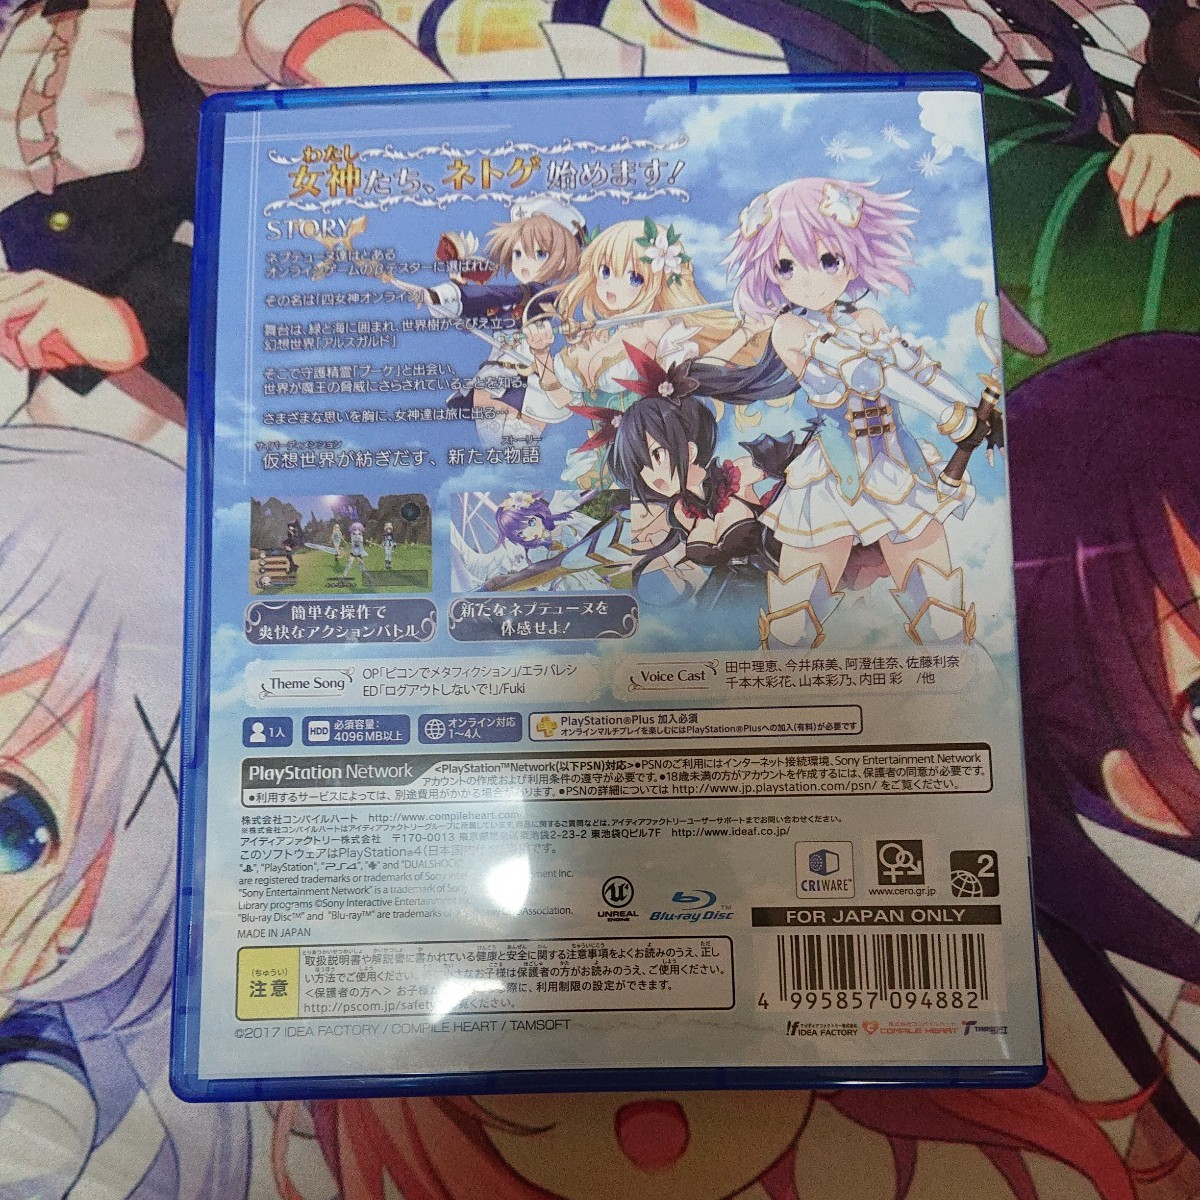 PS4 ソフト 四女神オンライン ネプテューヌ ネプチューヌ